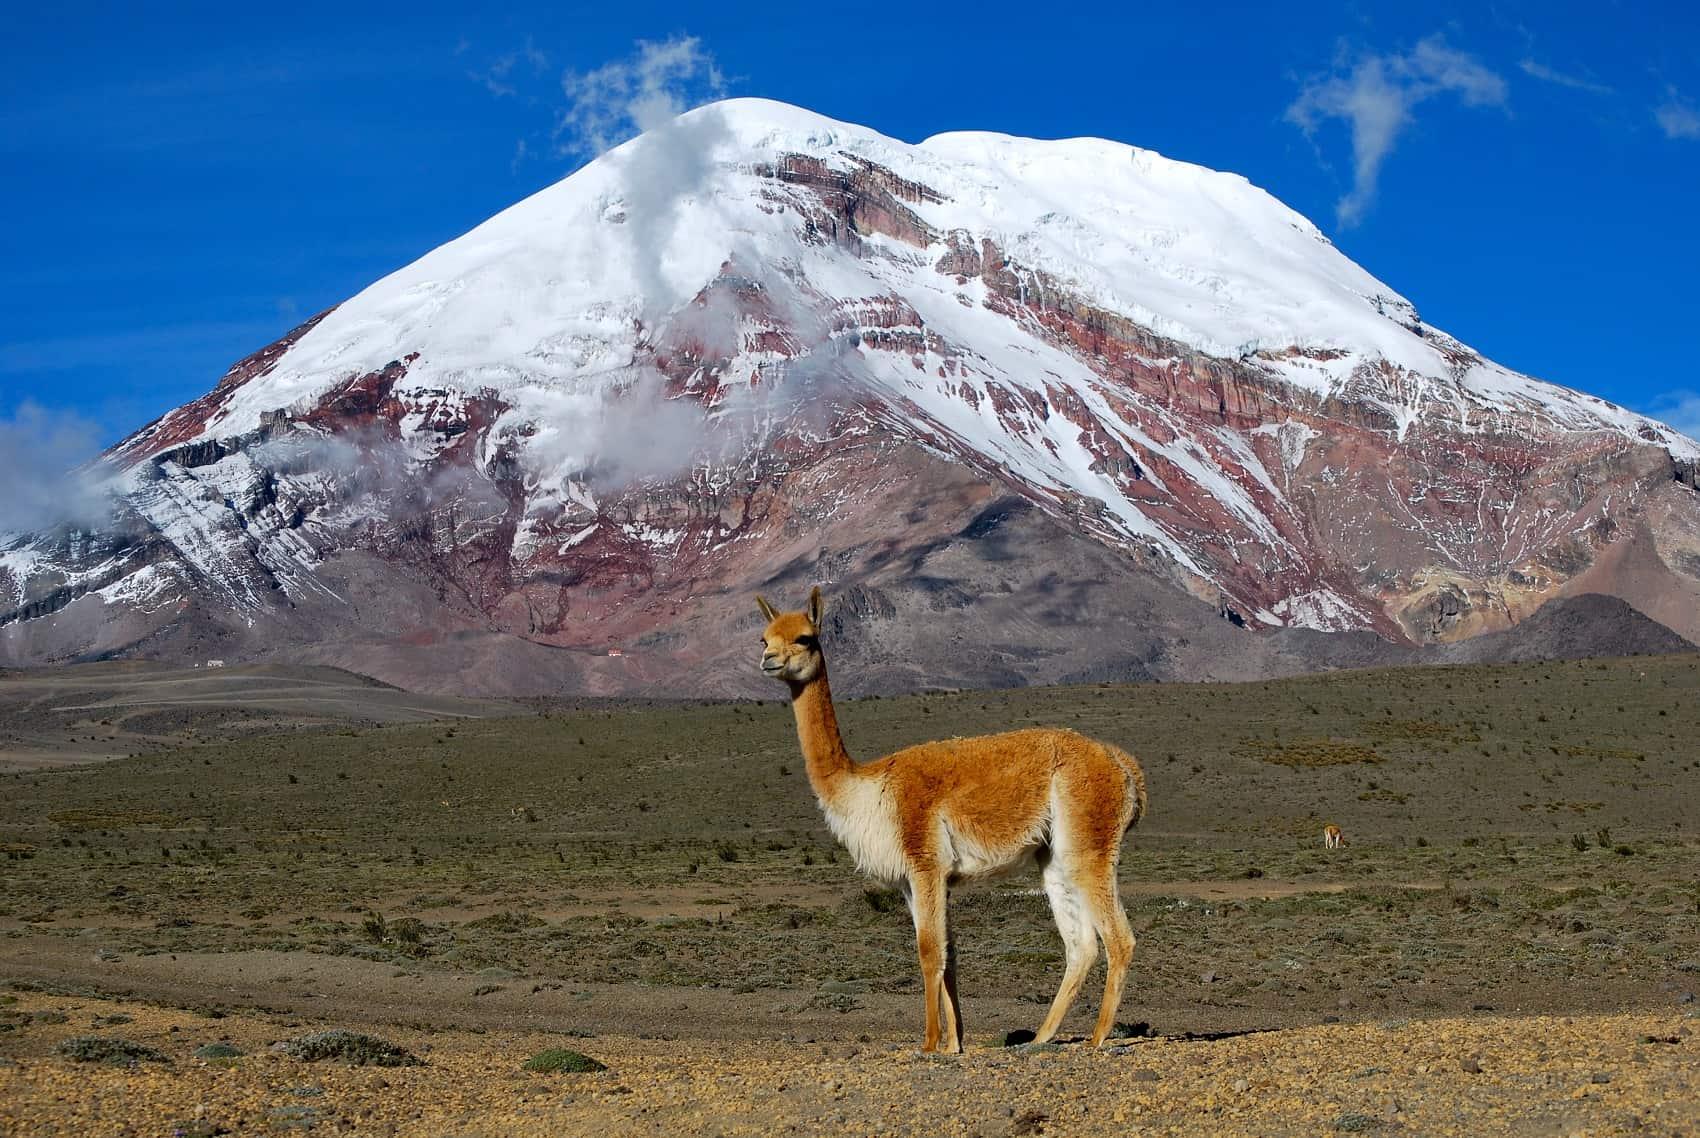 A vicuña stands in front of Ecuador's Chimborazo Volcano.